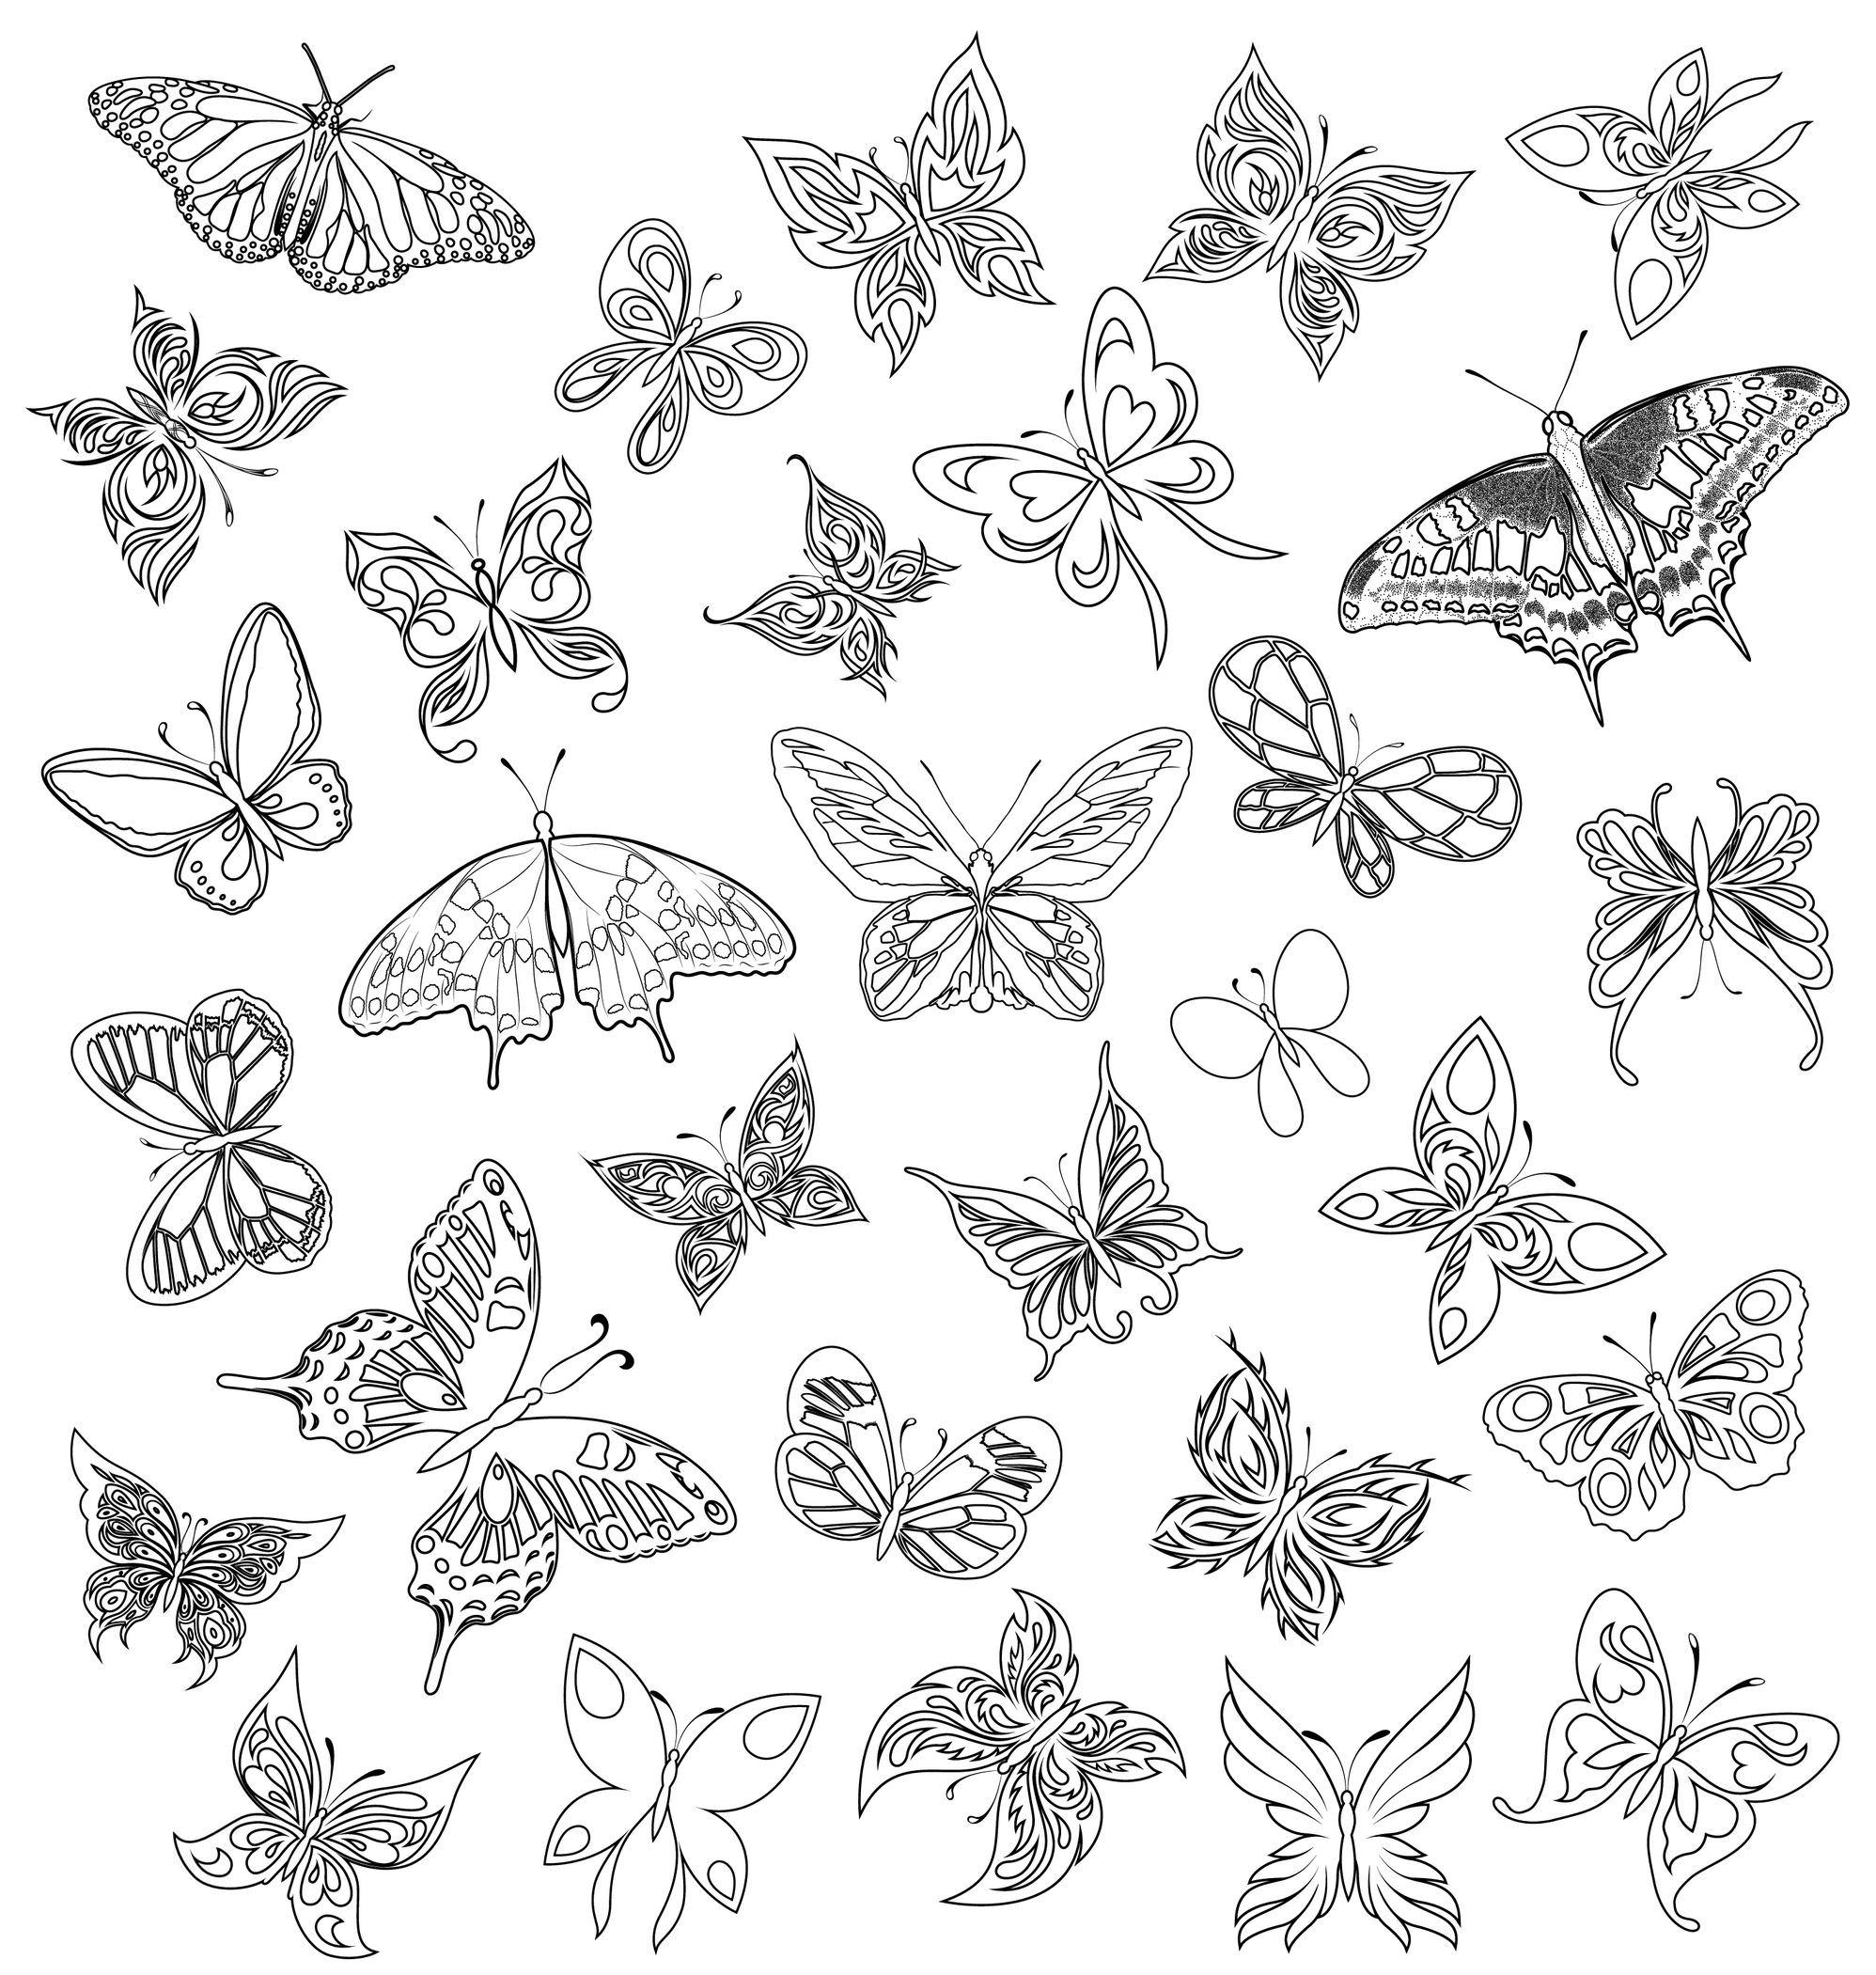 Coloriage De Papillon tout Papillon Dessin Facile